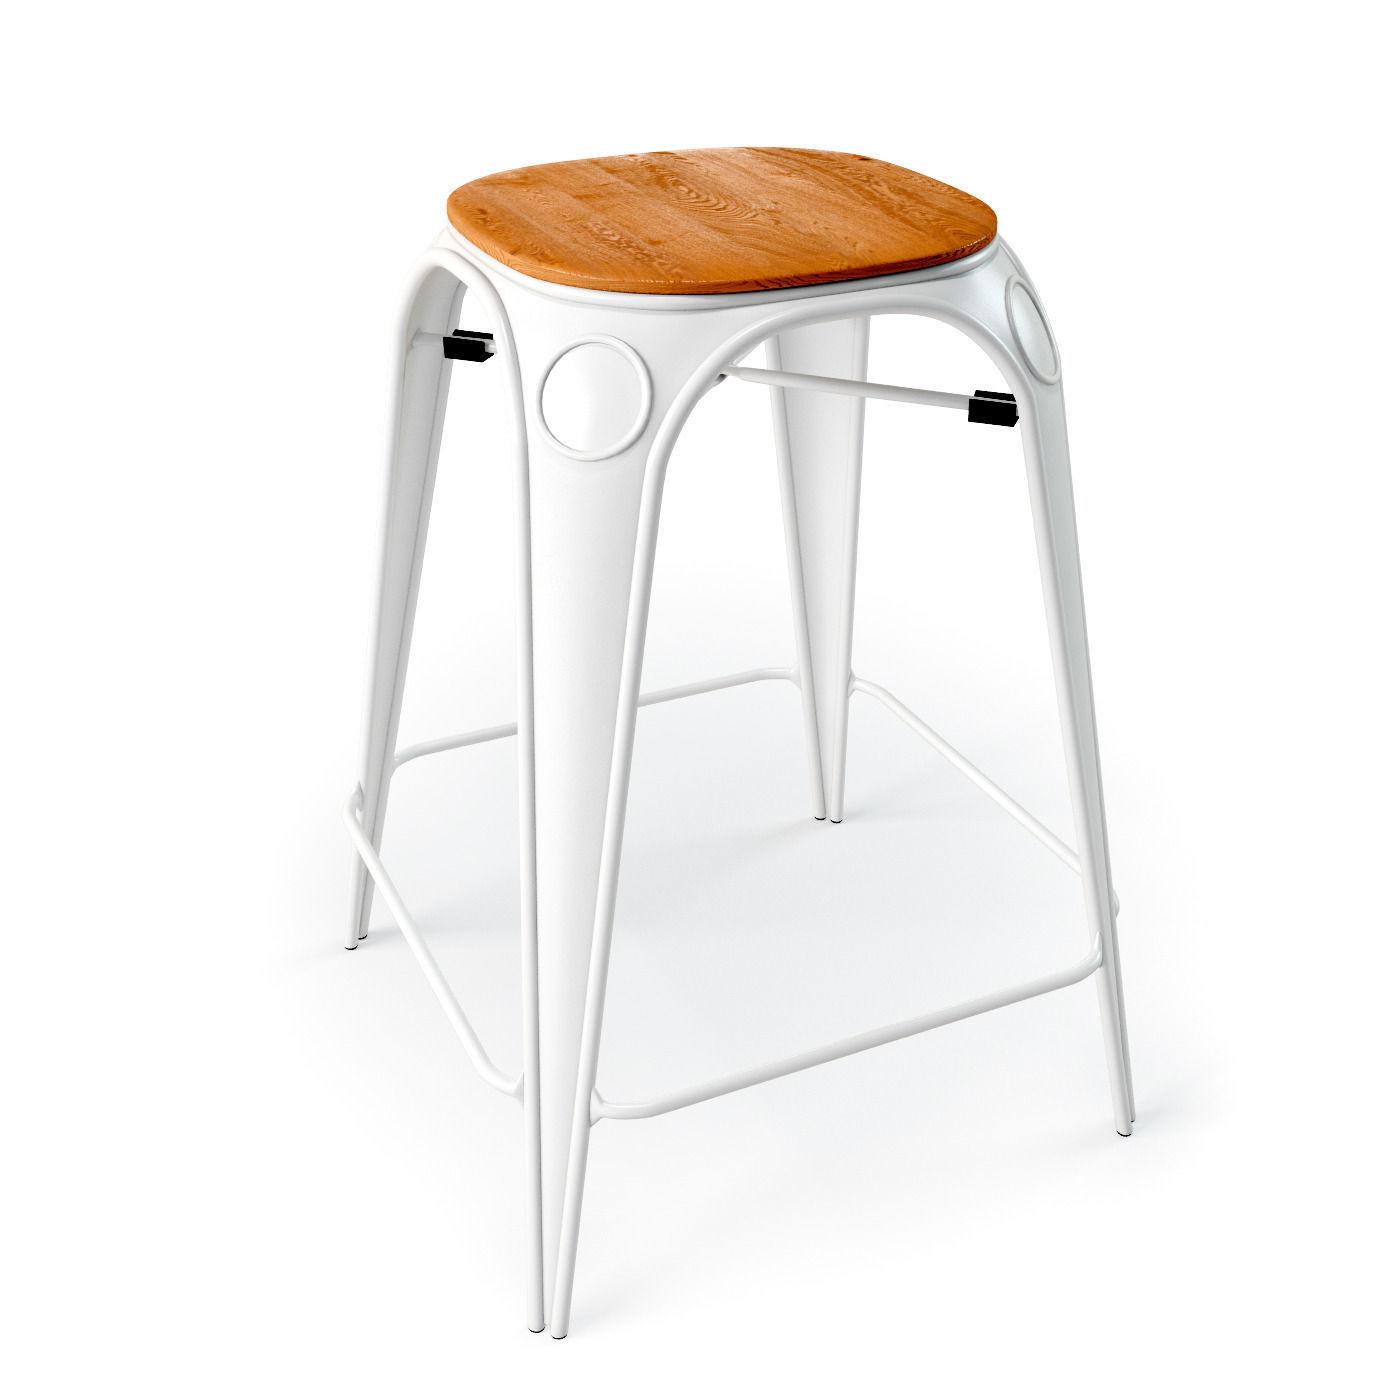 Louix chair High and stool 3D